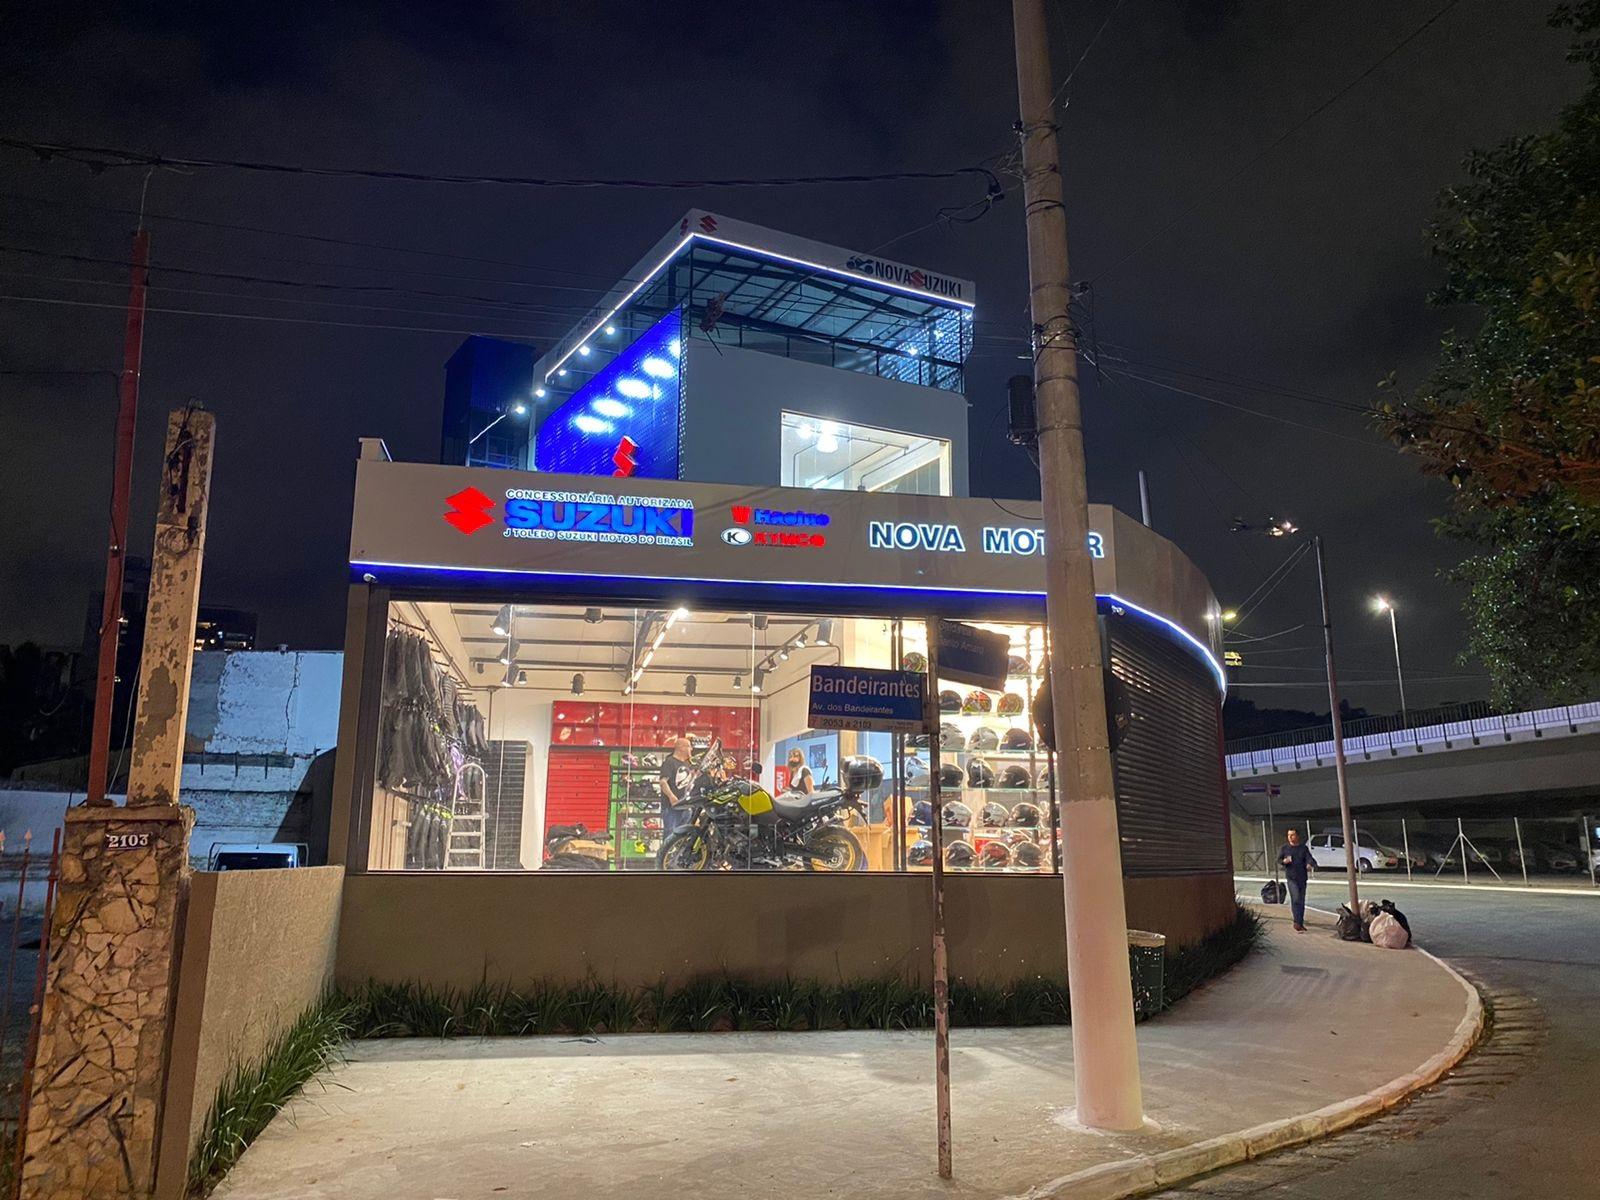 Nova loja Concessionária Nova Suzuki no Itaim Bibi